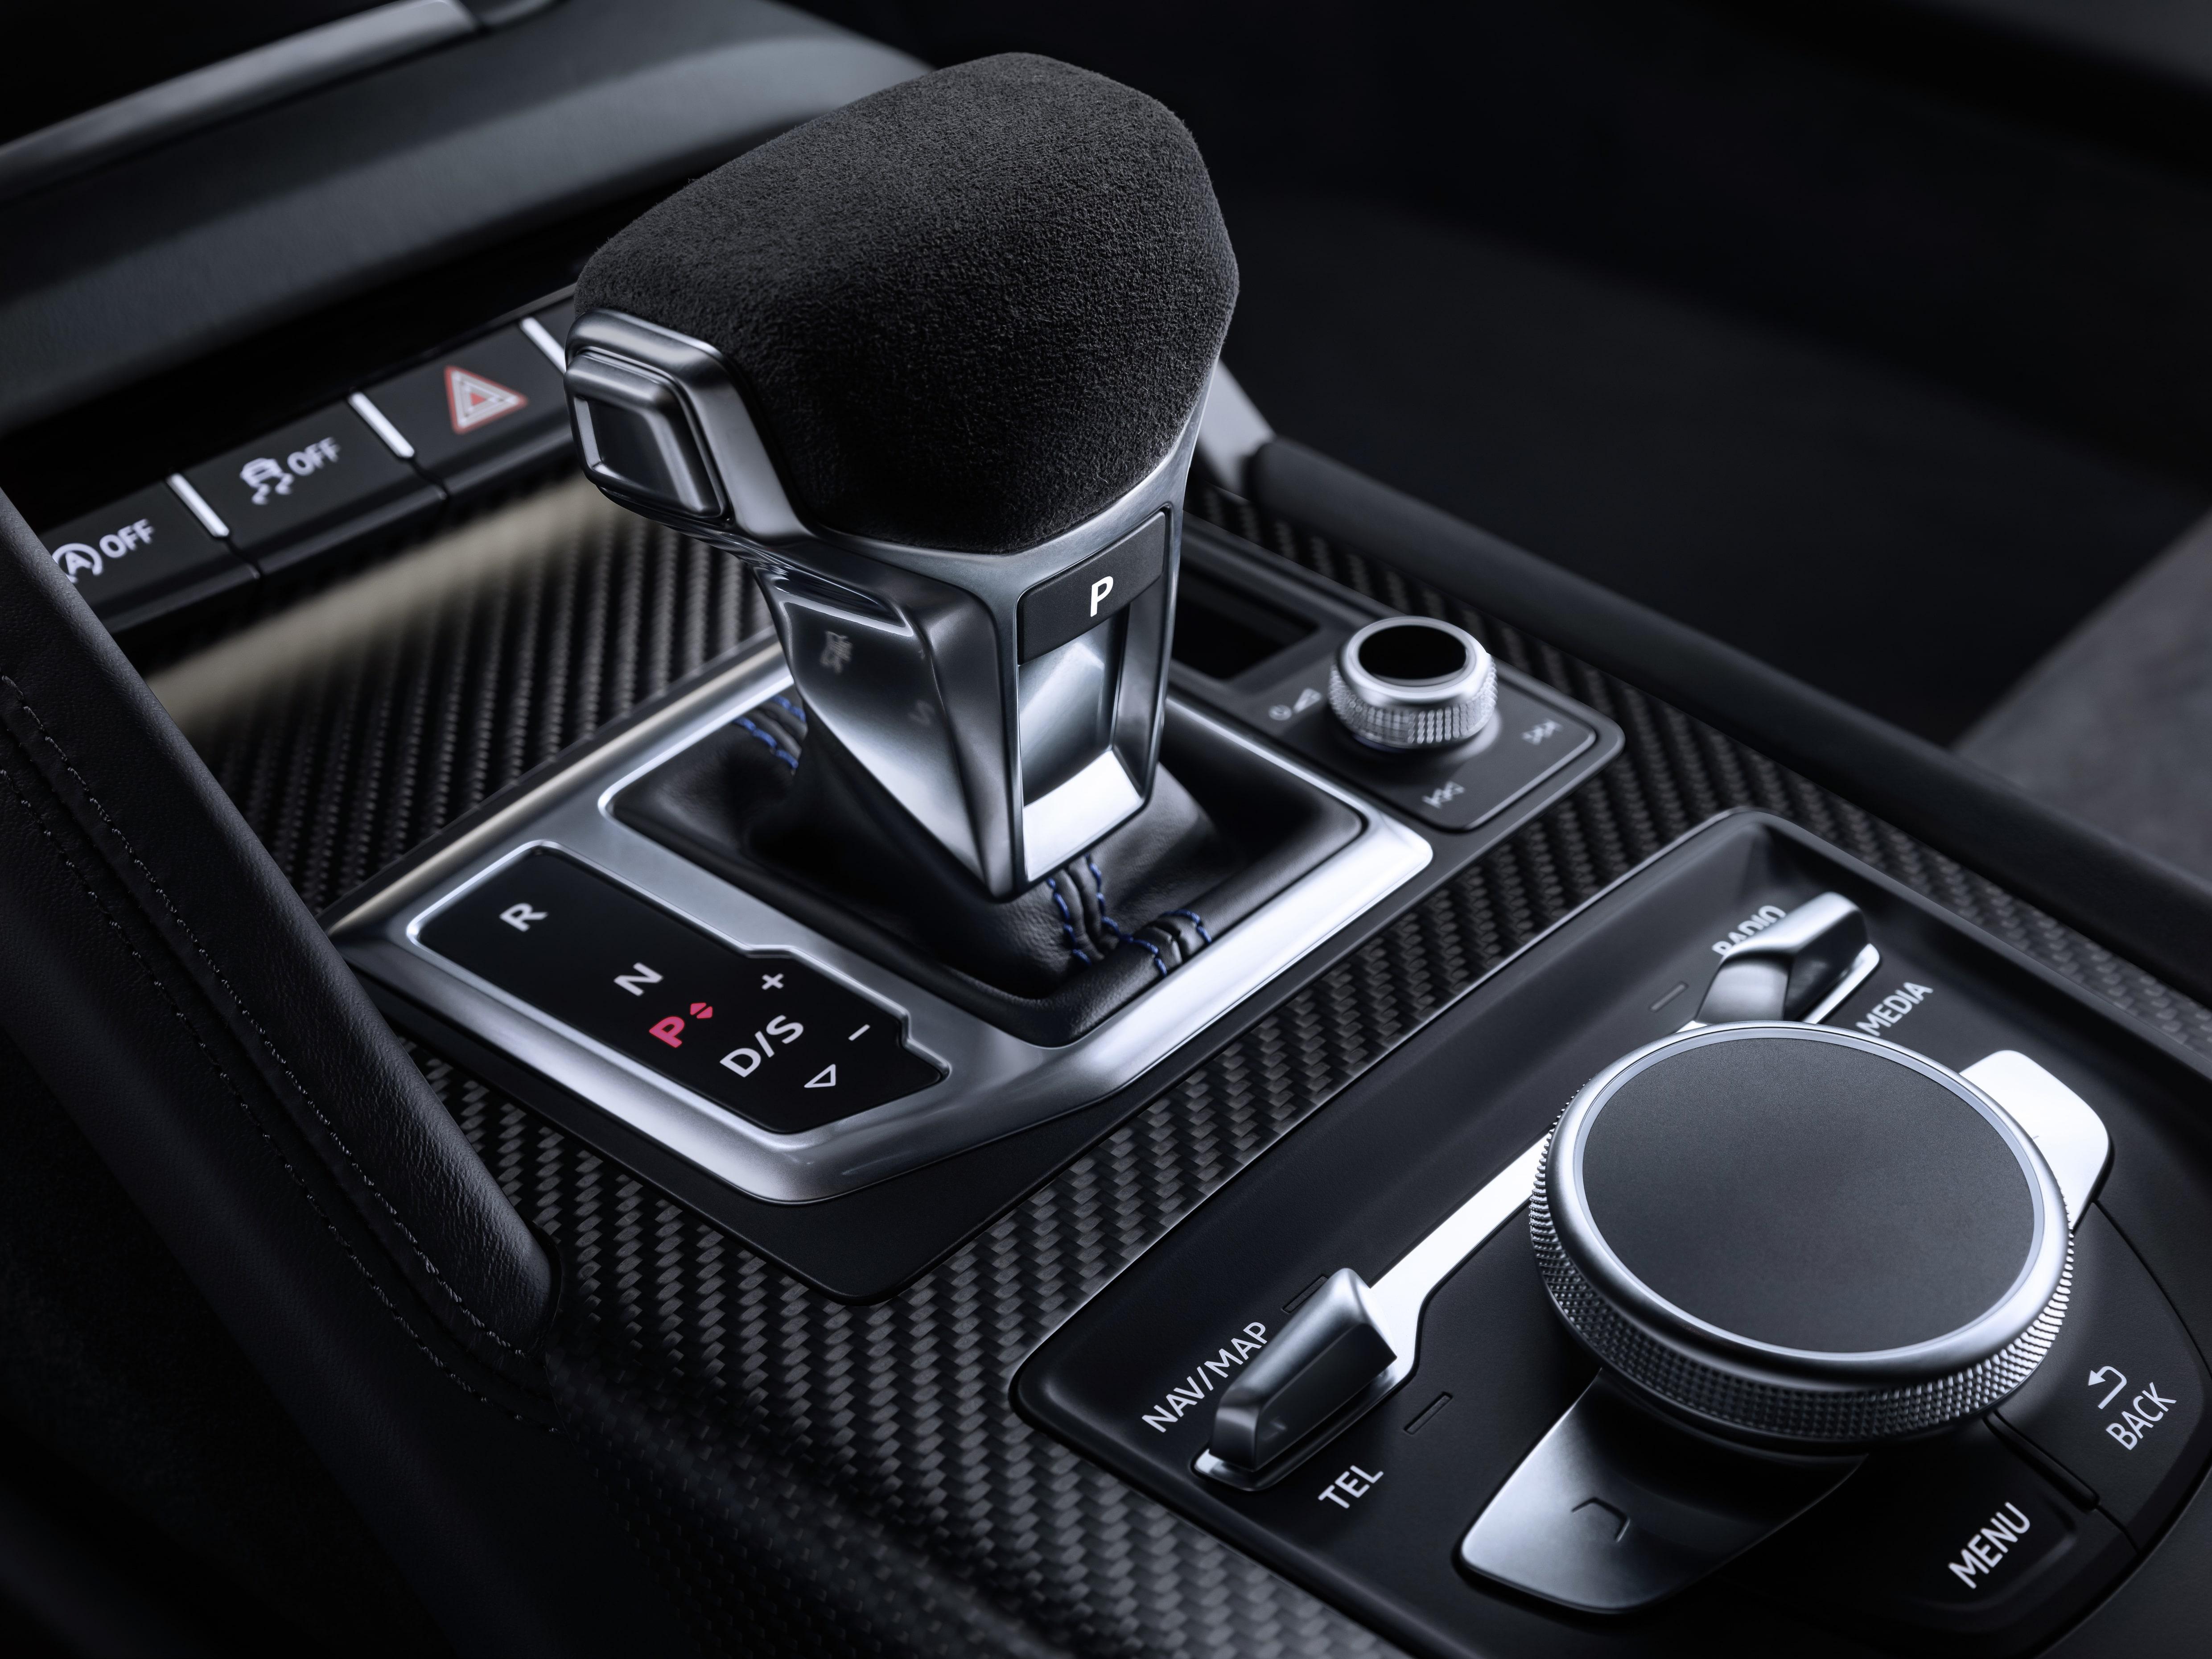 audi r8 audi r8 Audi R8 2019: design aggressivo e performance superiori a1812849 large